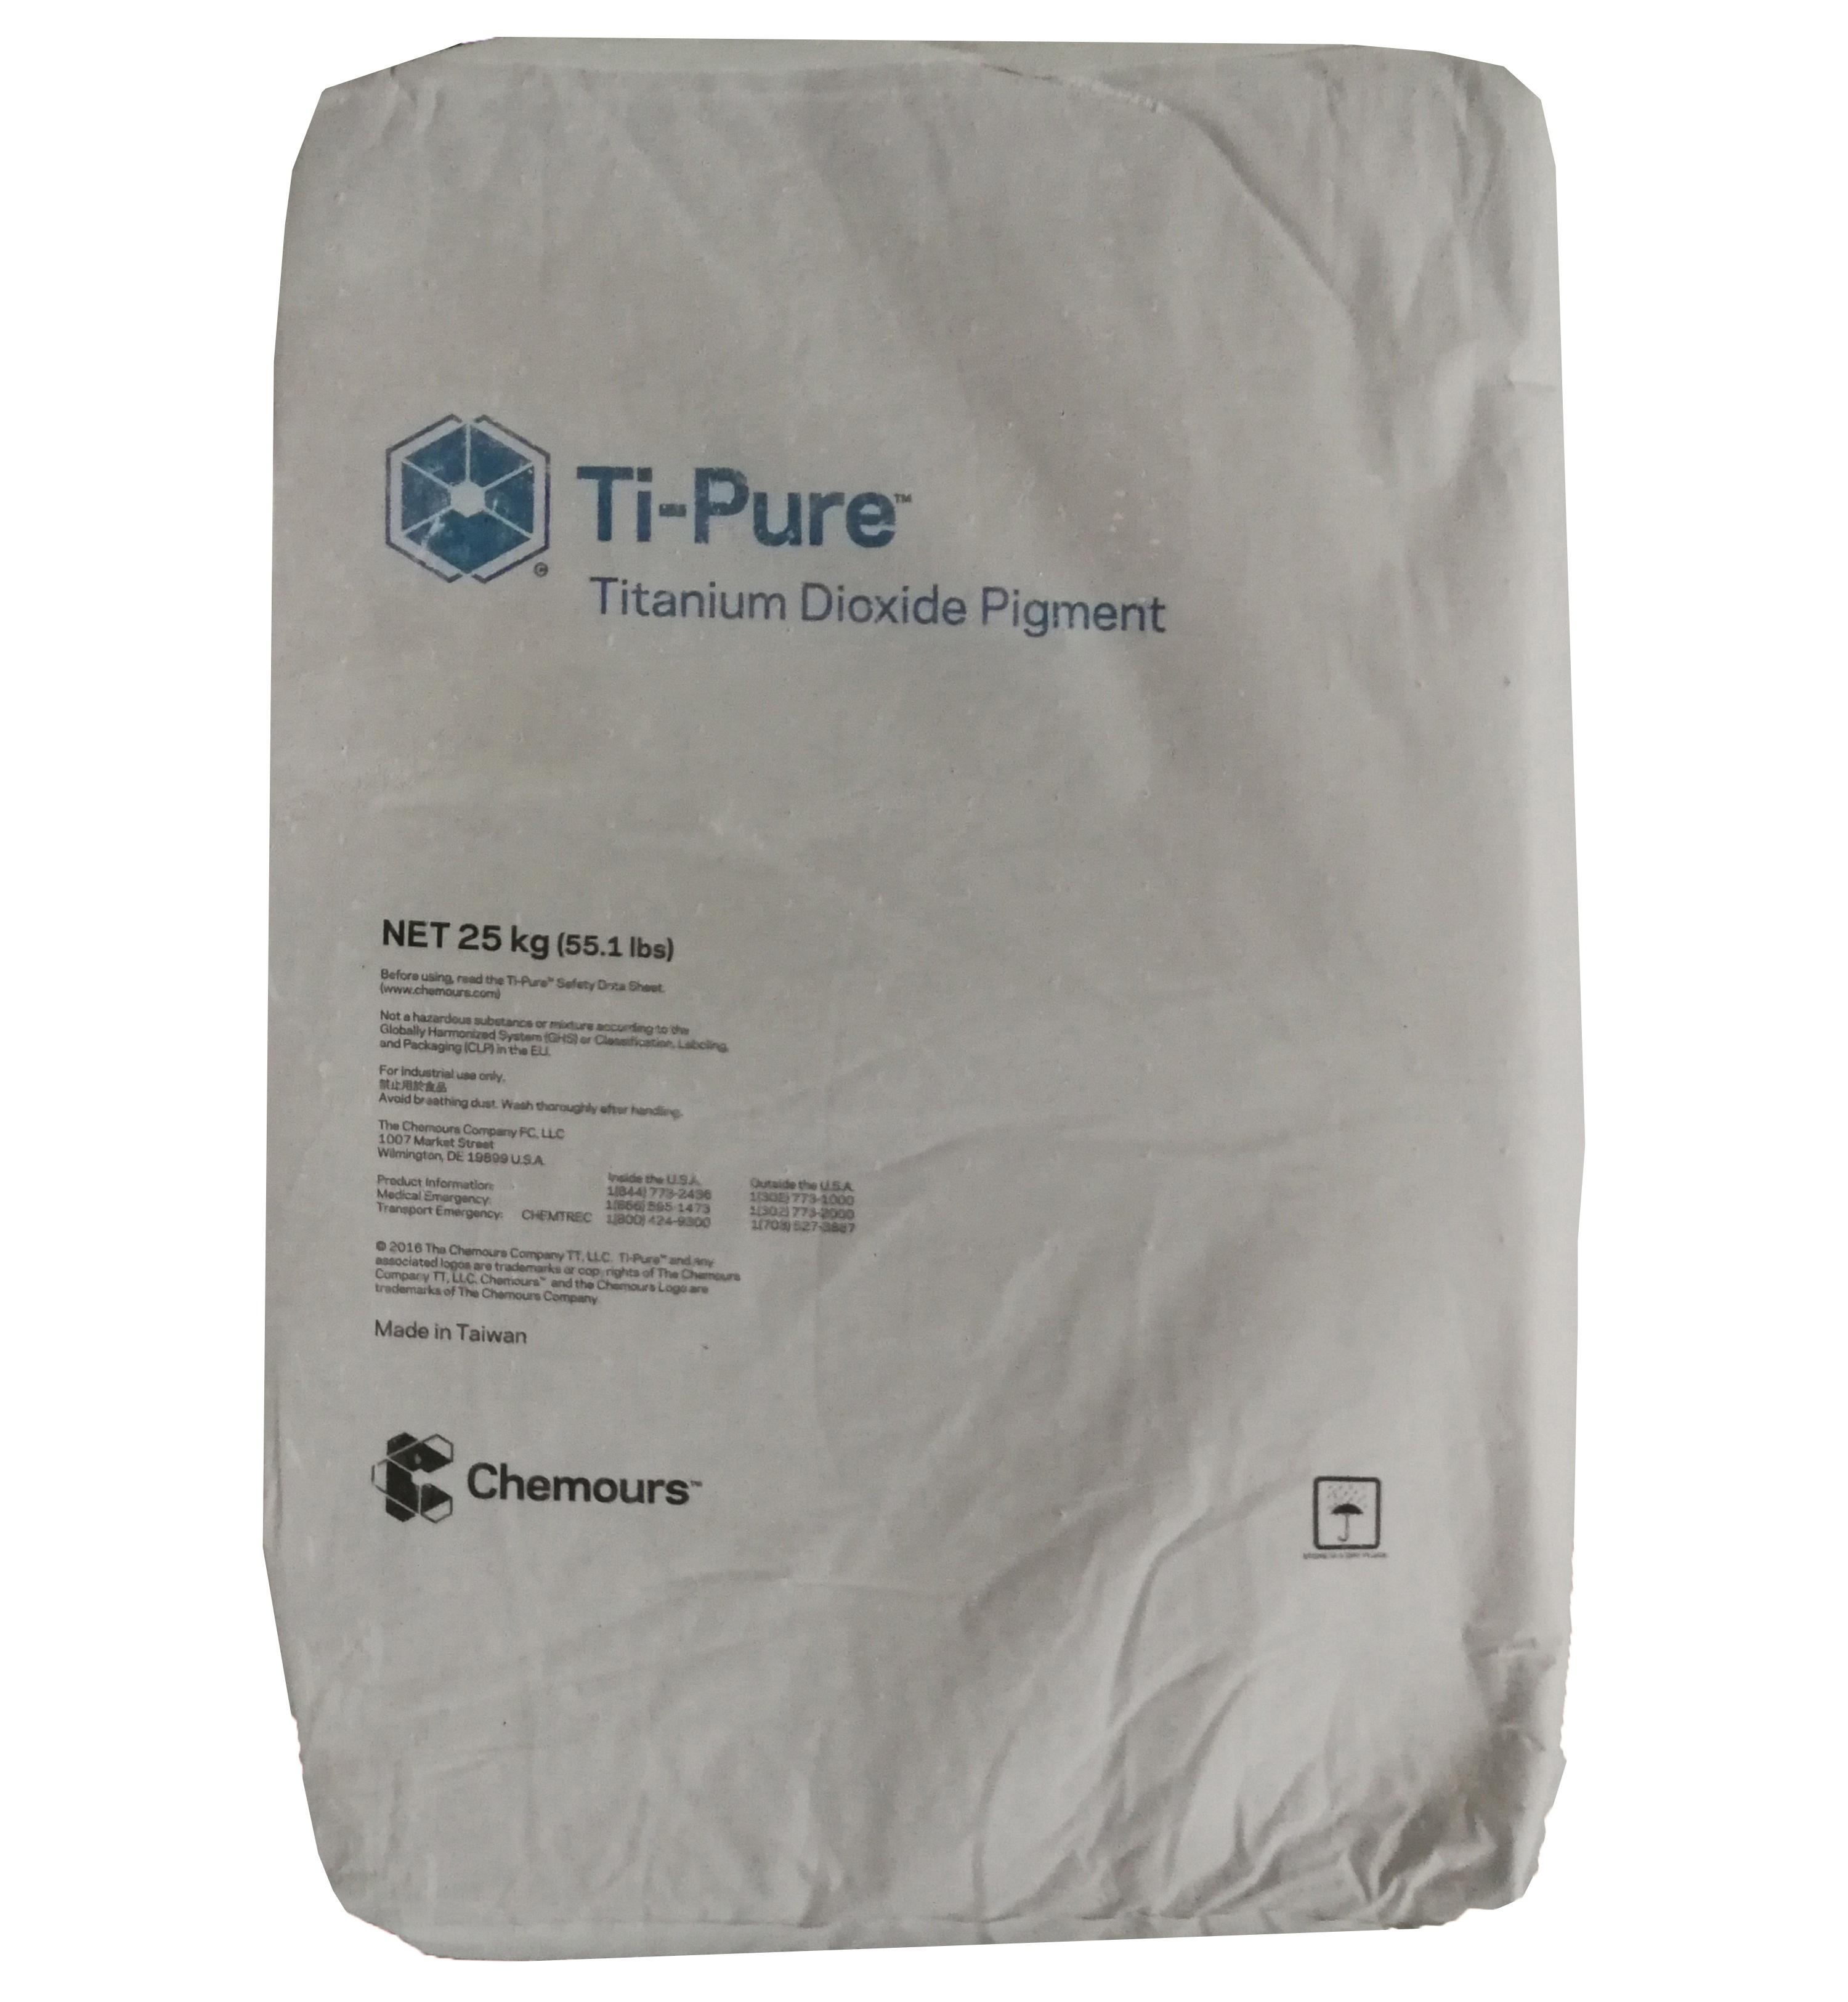 Chemours Titanium Dioxide Pigment Tio2 for General Use R 902